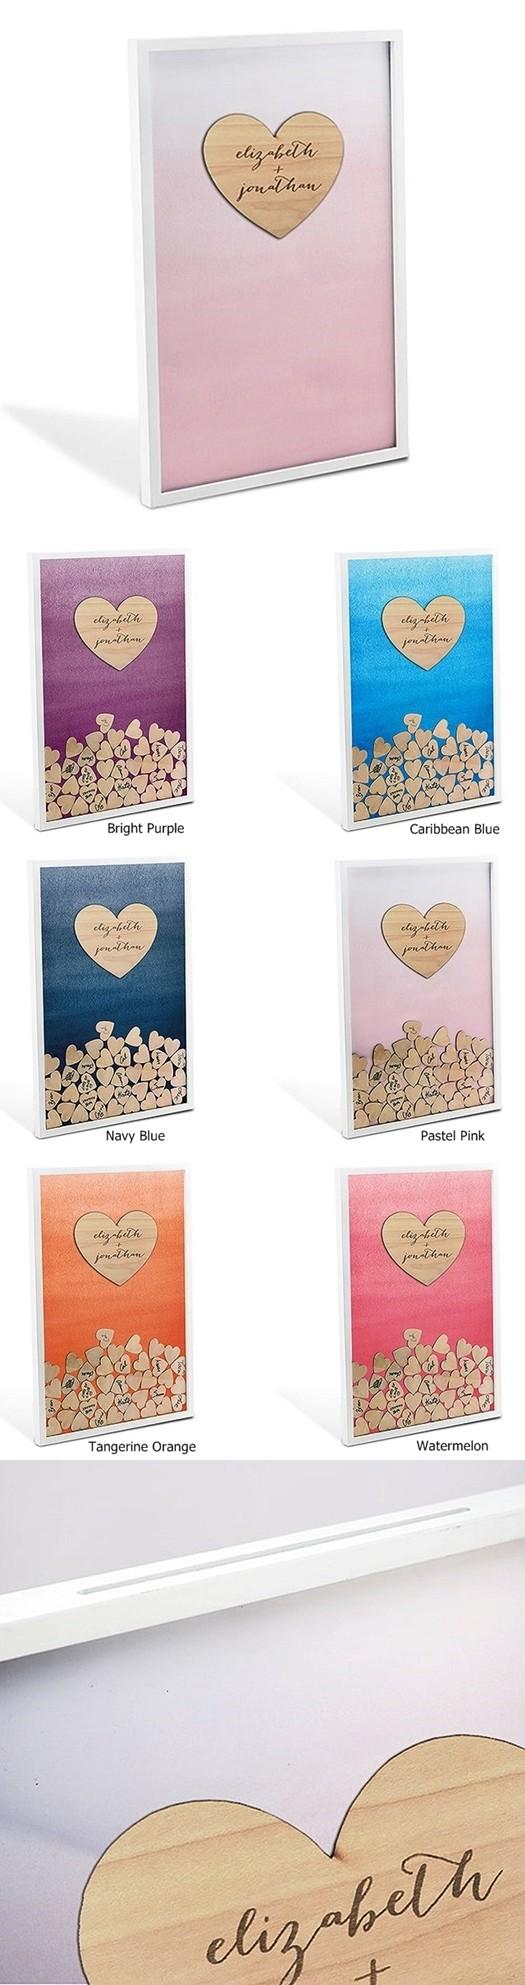 Personalized Aqueous Wedding Drop Box Guest Book w/ Hearts (6 Colors)